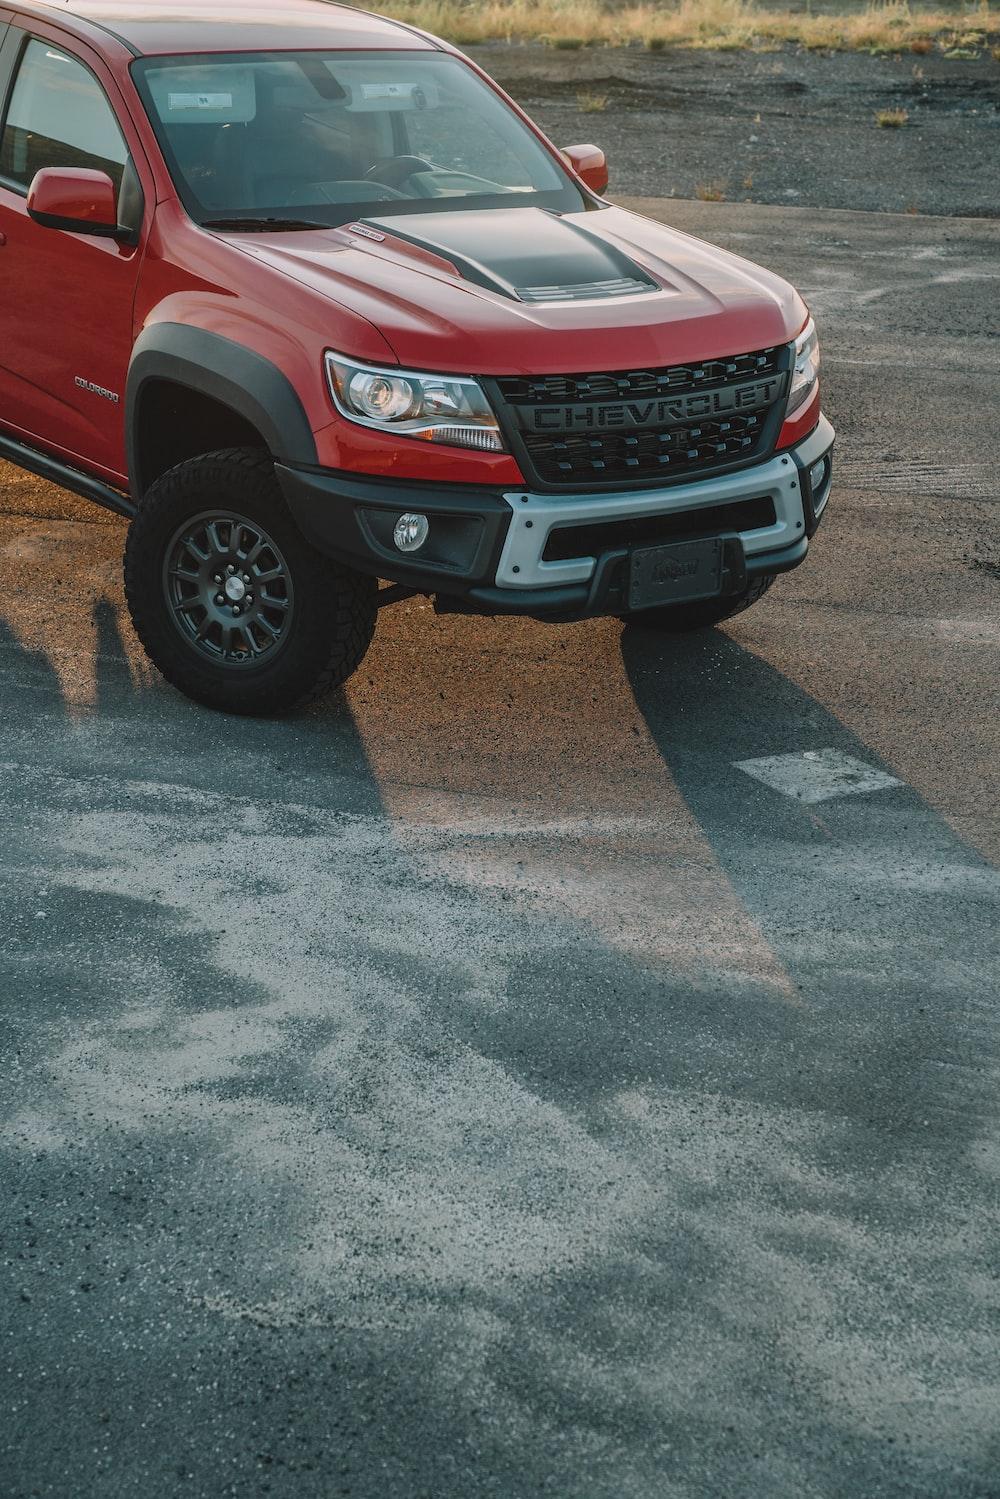 red Chevrolet SUV